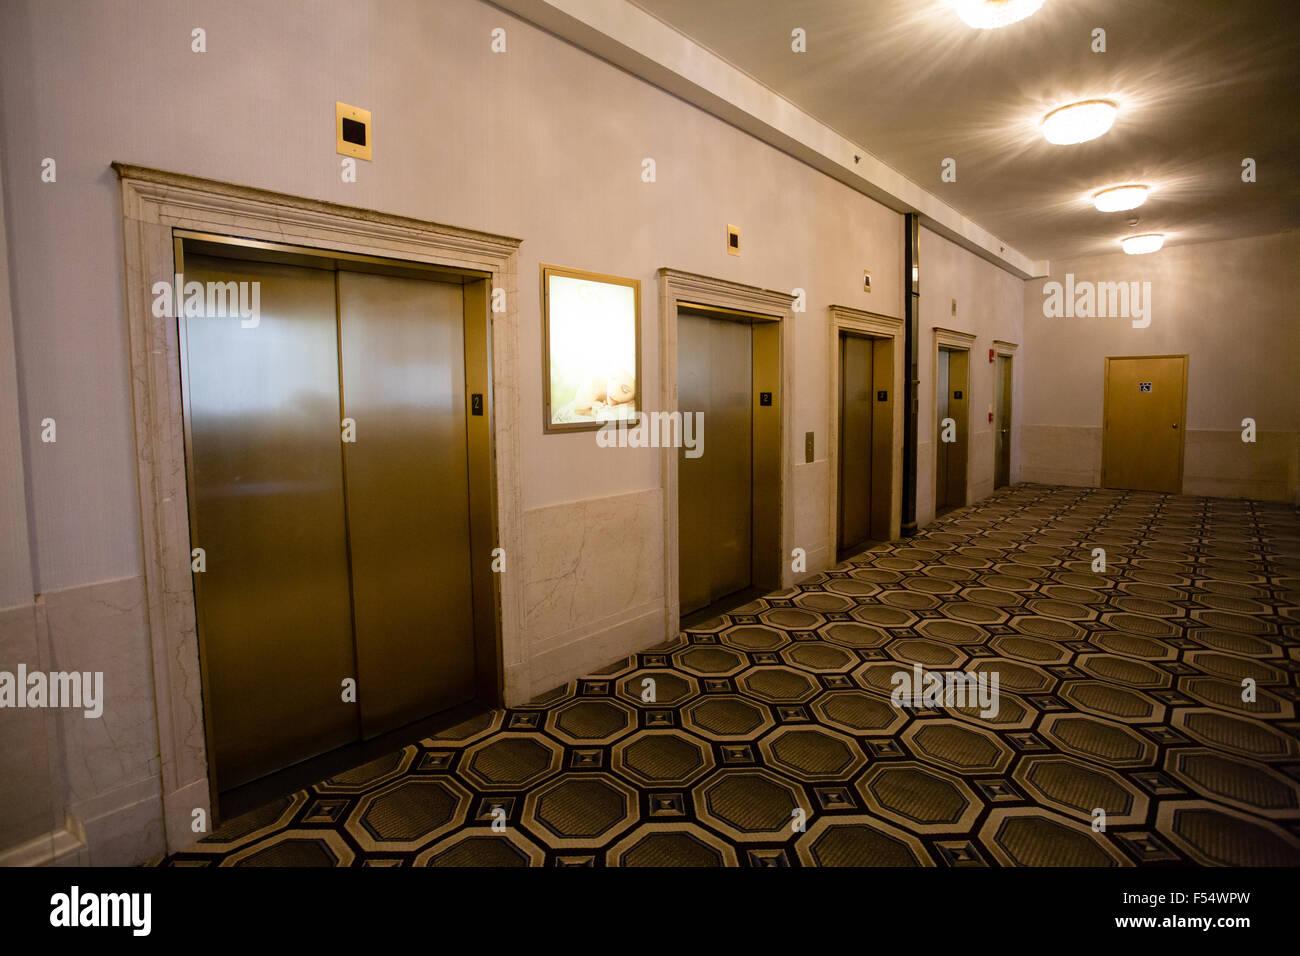 providence biltmore hotel elevators - Stock Image